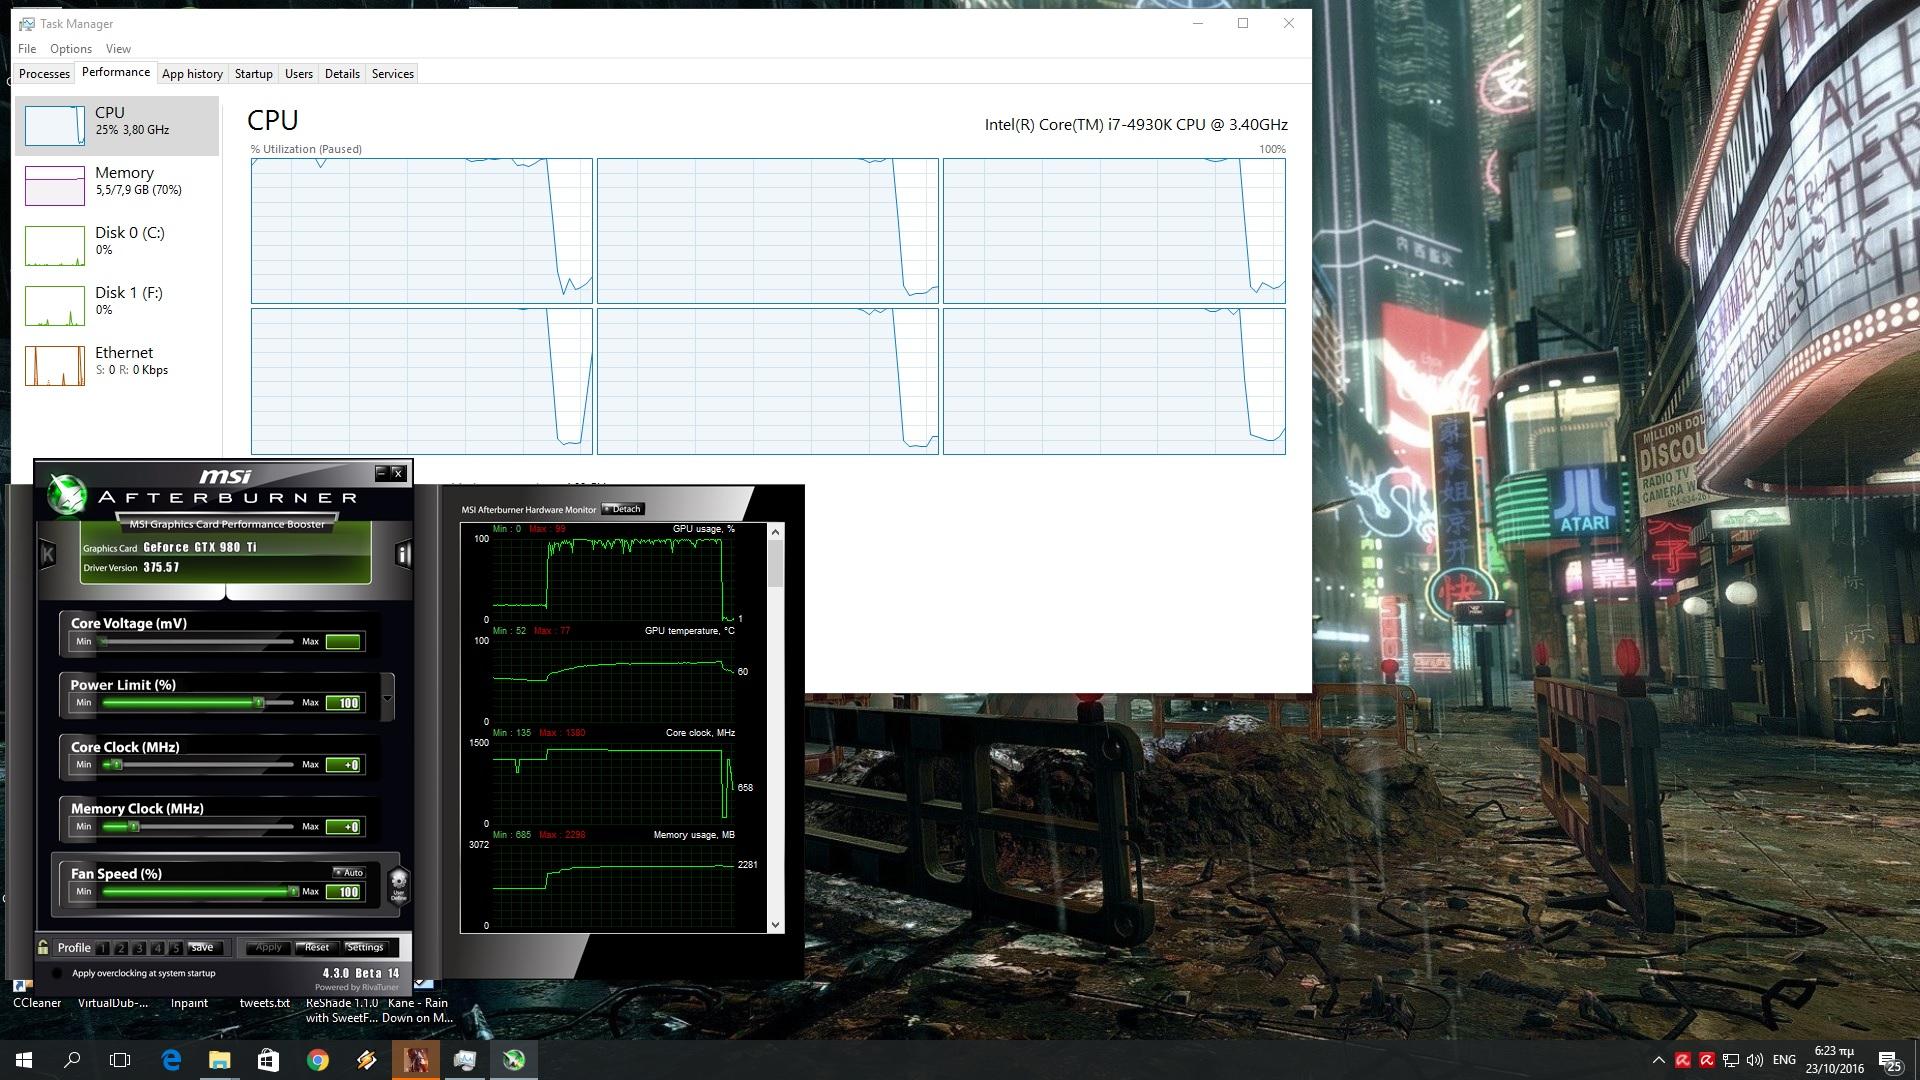 Battlefield 1 - PC Performance Analysis - DSOGaming